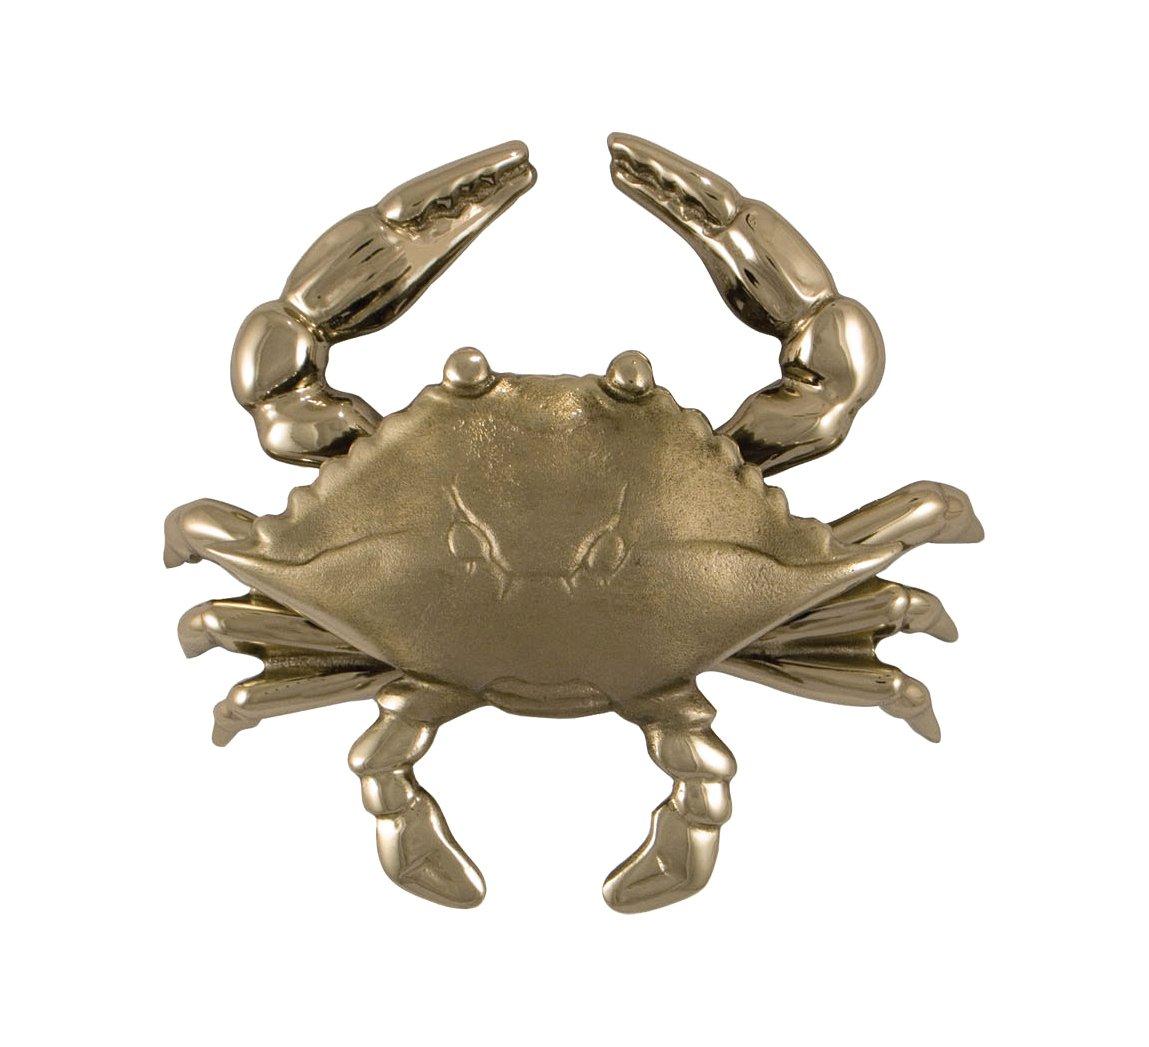 Blue Crab Door Knocker - Nickel Silver (Standard Size)